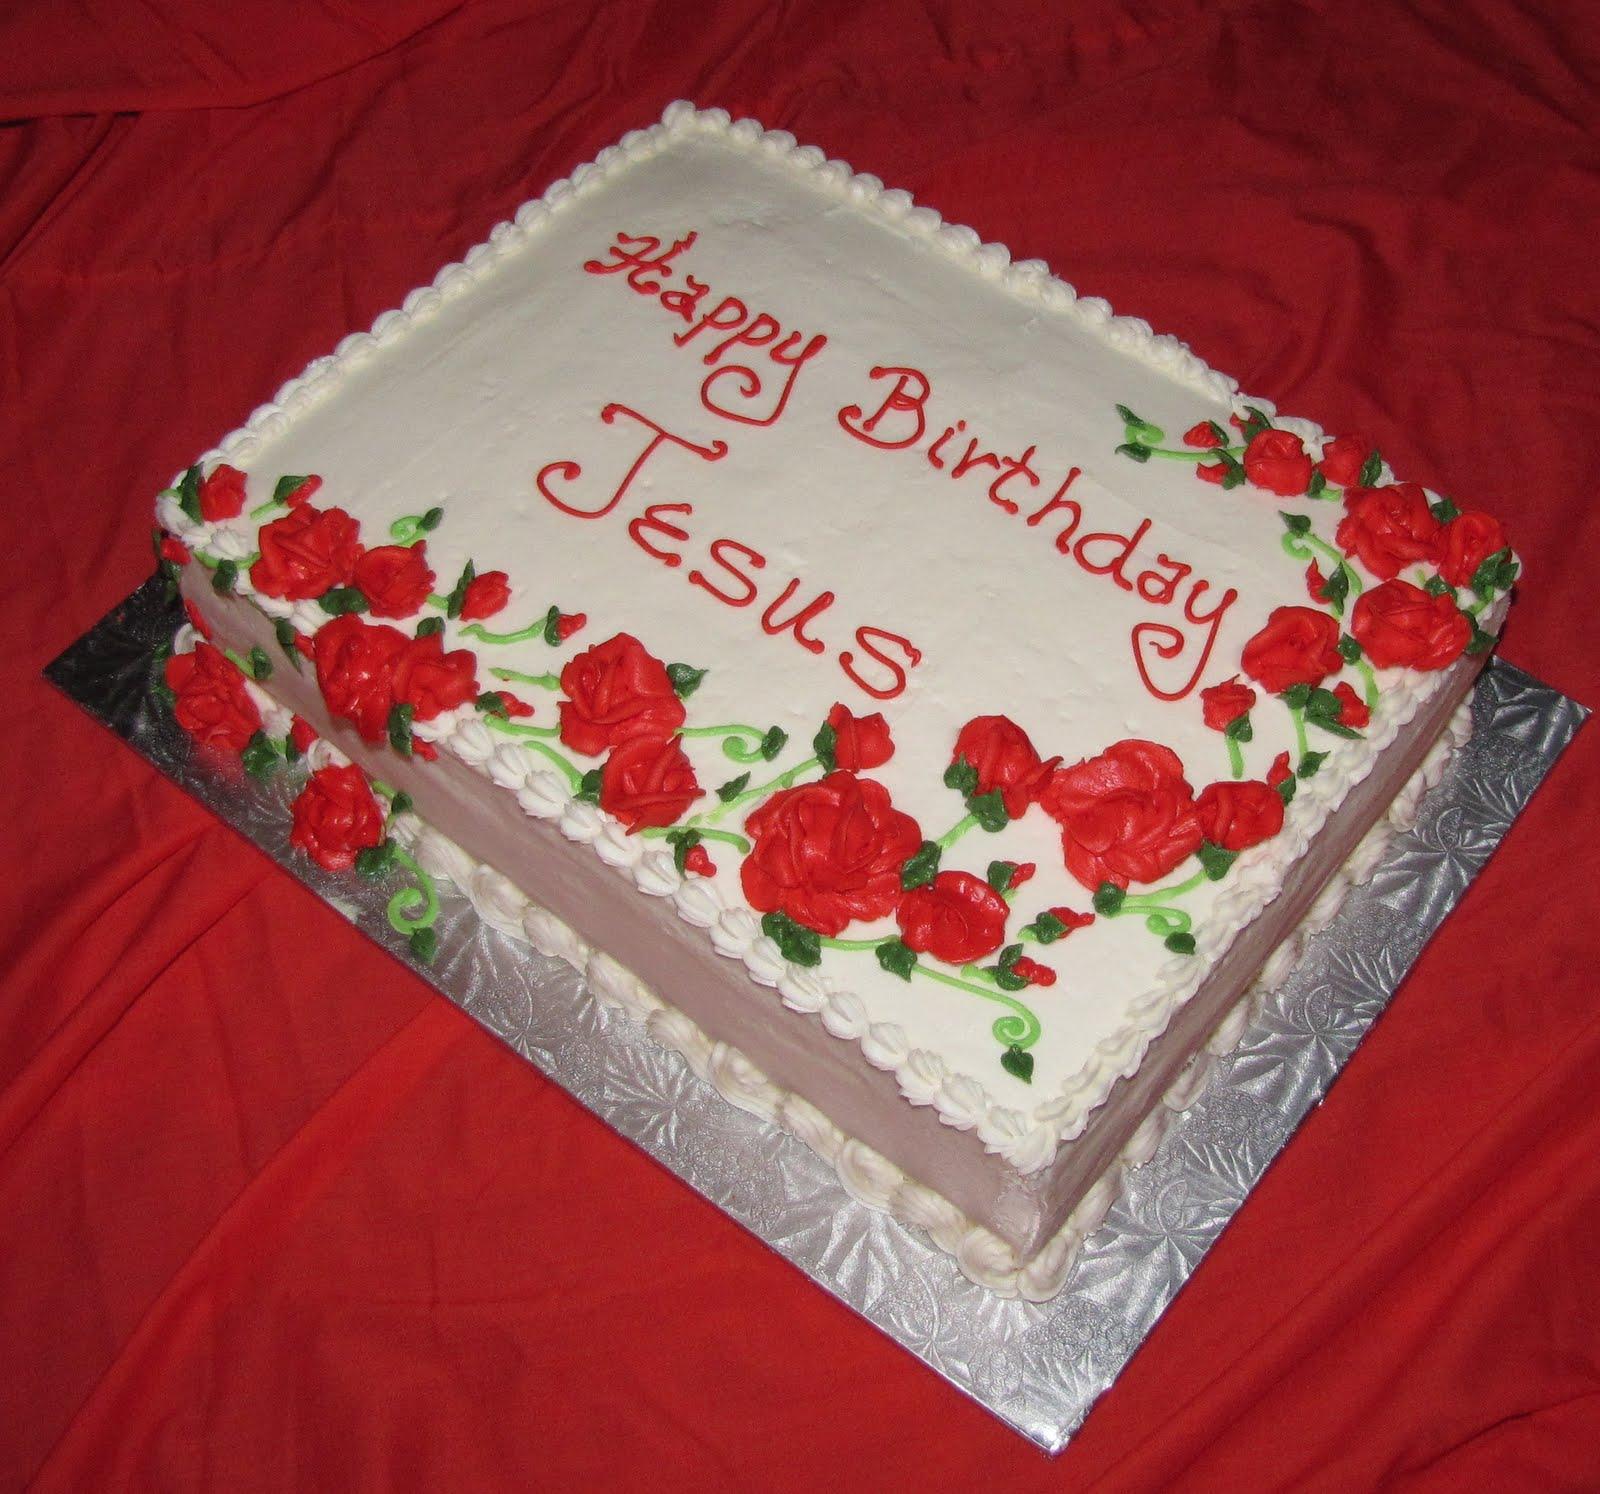 Finishing Well Happy Birthday Jesus